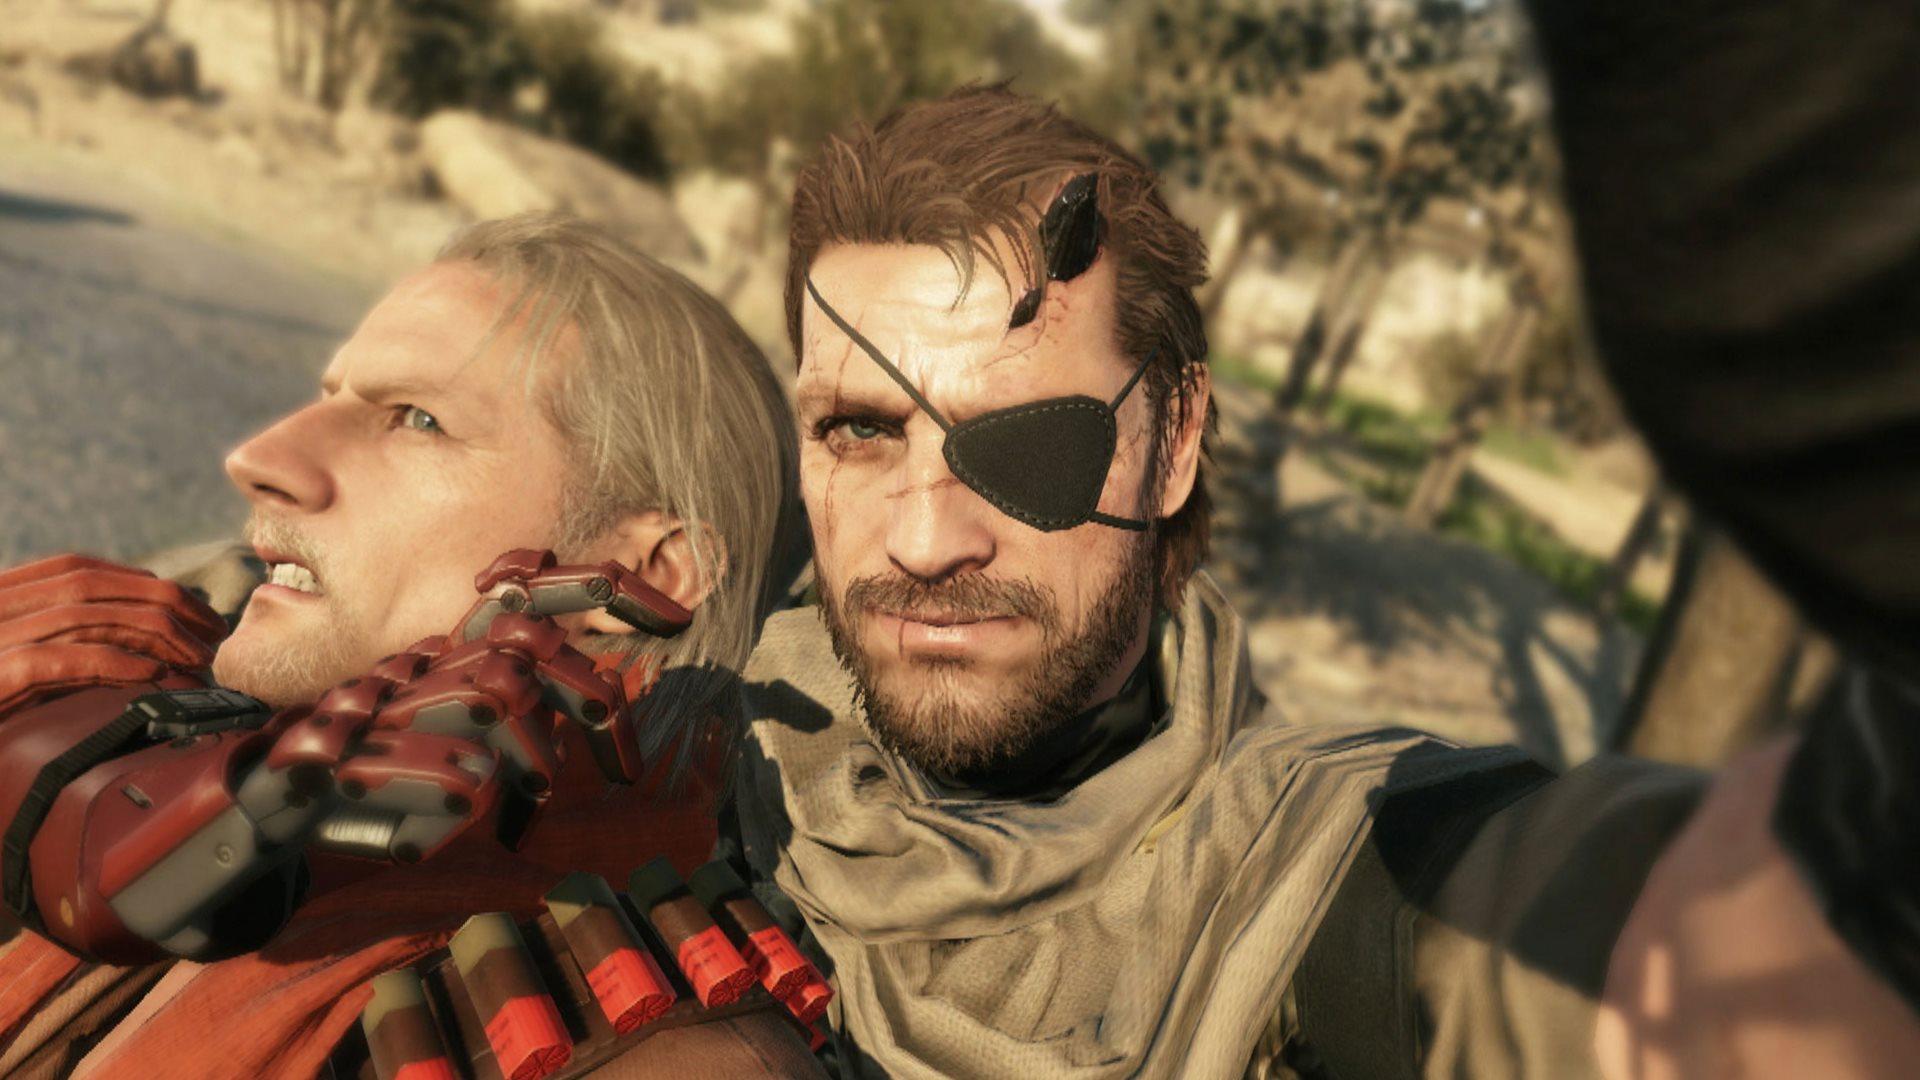 Free Download Metal Gear Solid V The Phantom Pain Hd Wallpaper 17